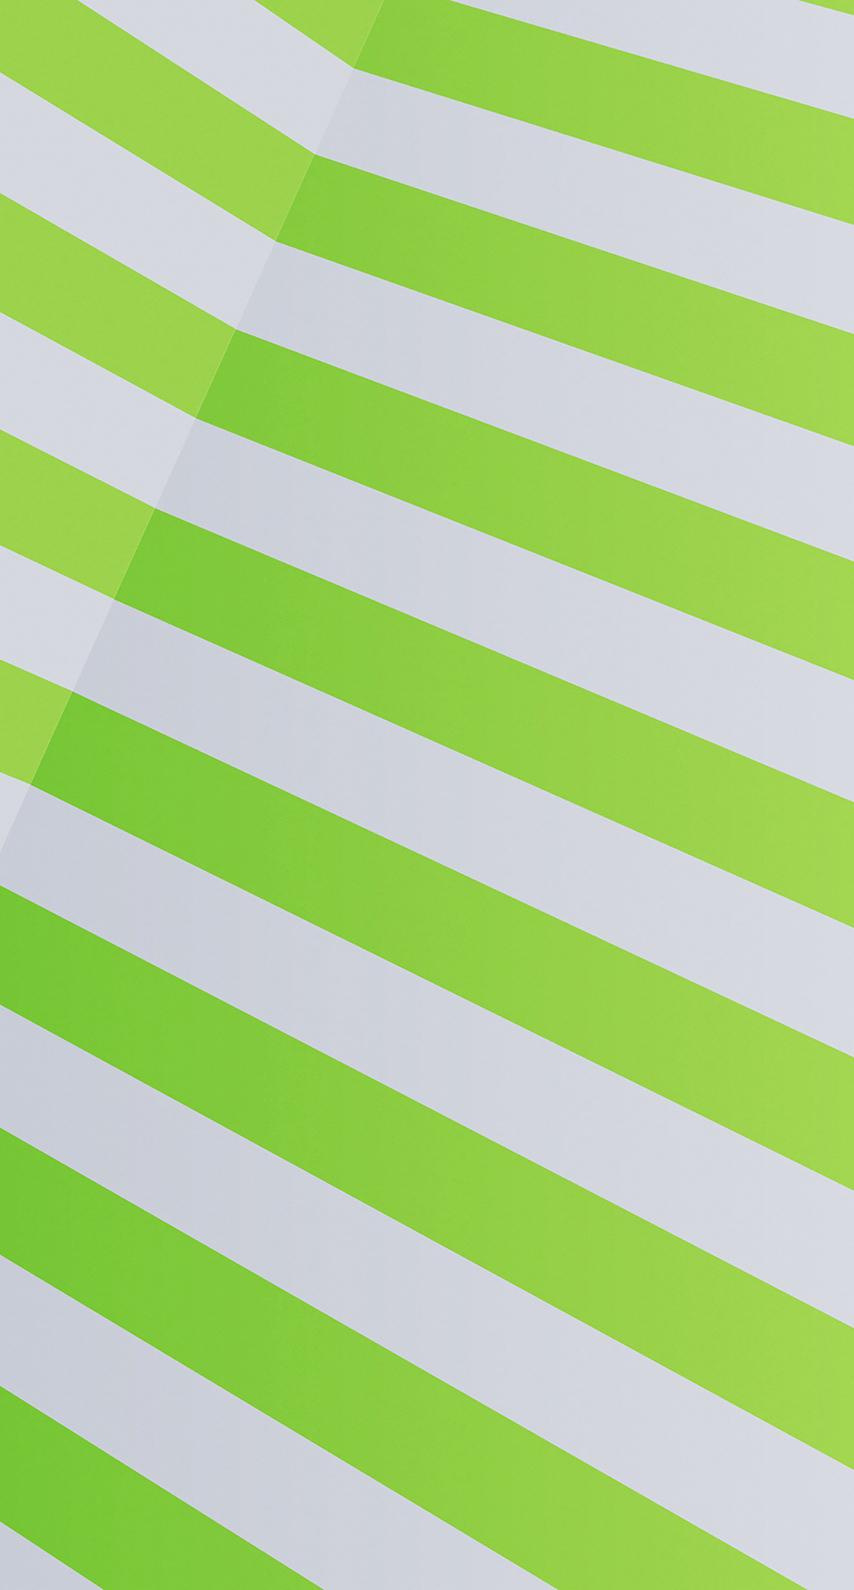 paper, design, background, wallpaper, desktop, illustration, line, stripe, decoration, fabric, style, seamless